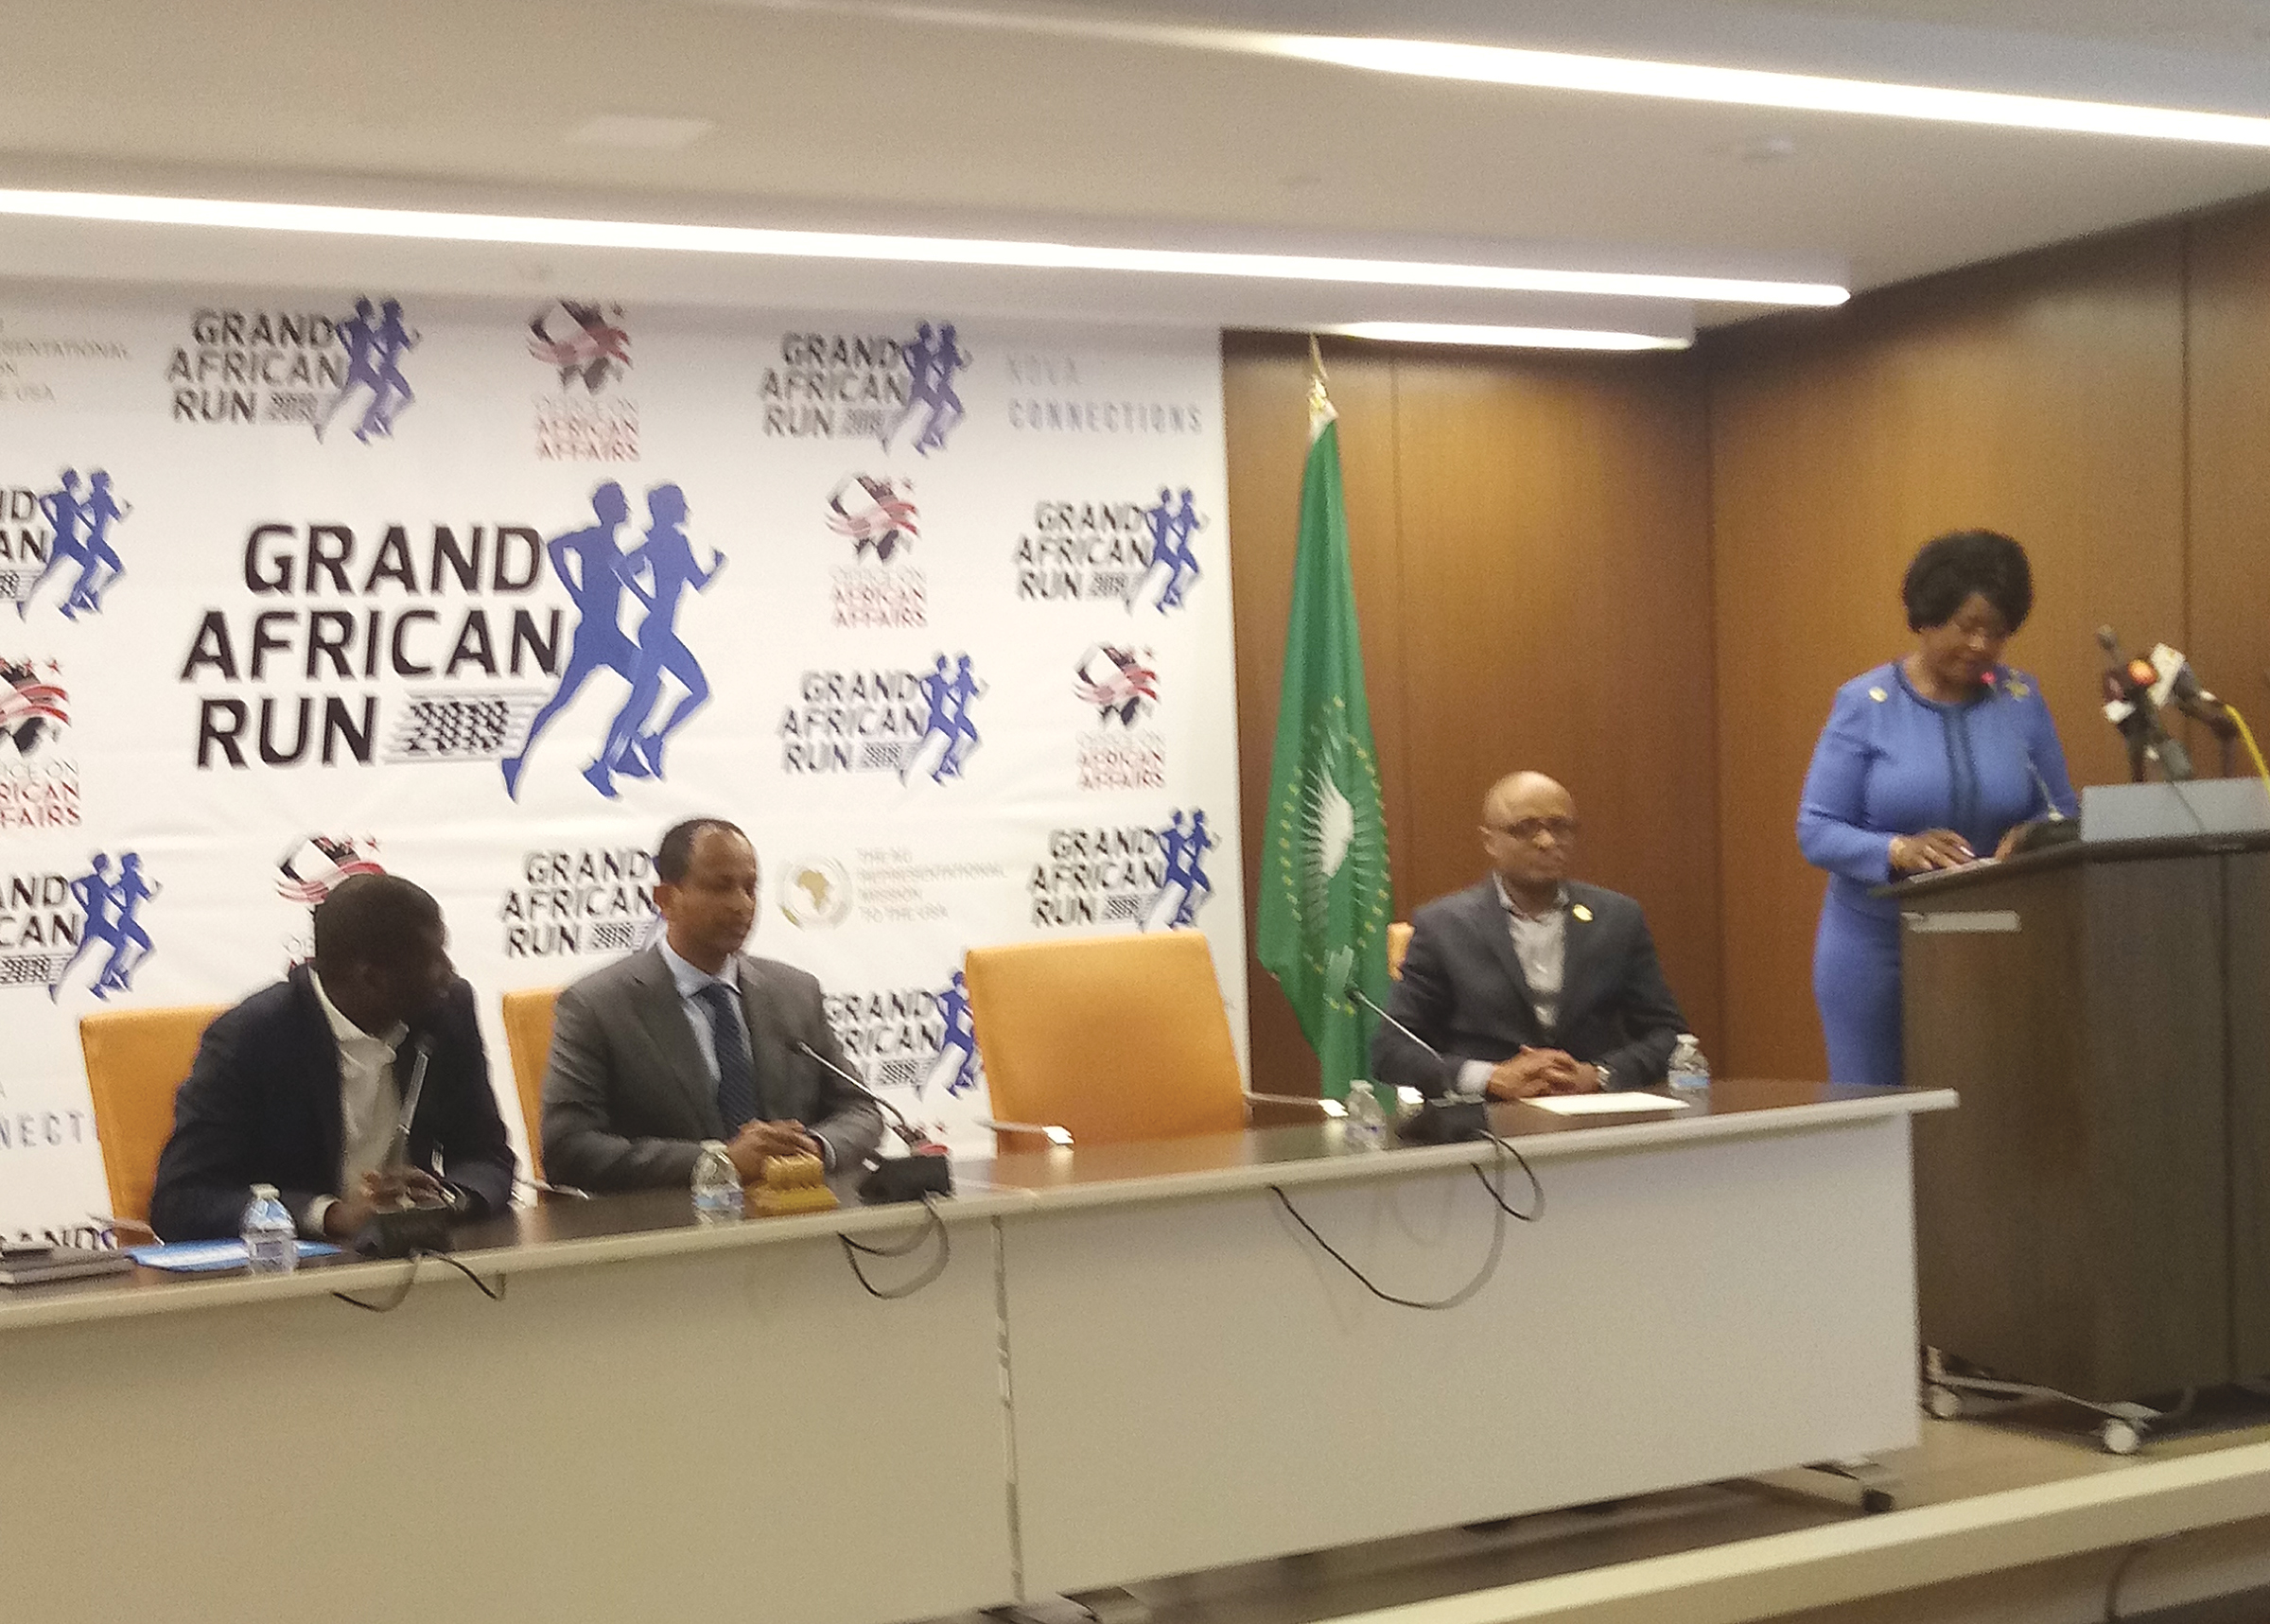 Inaugural Grand African Run Announced in Washington